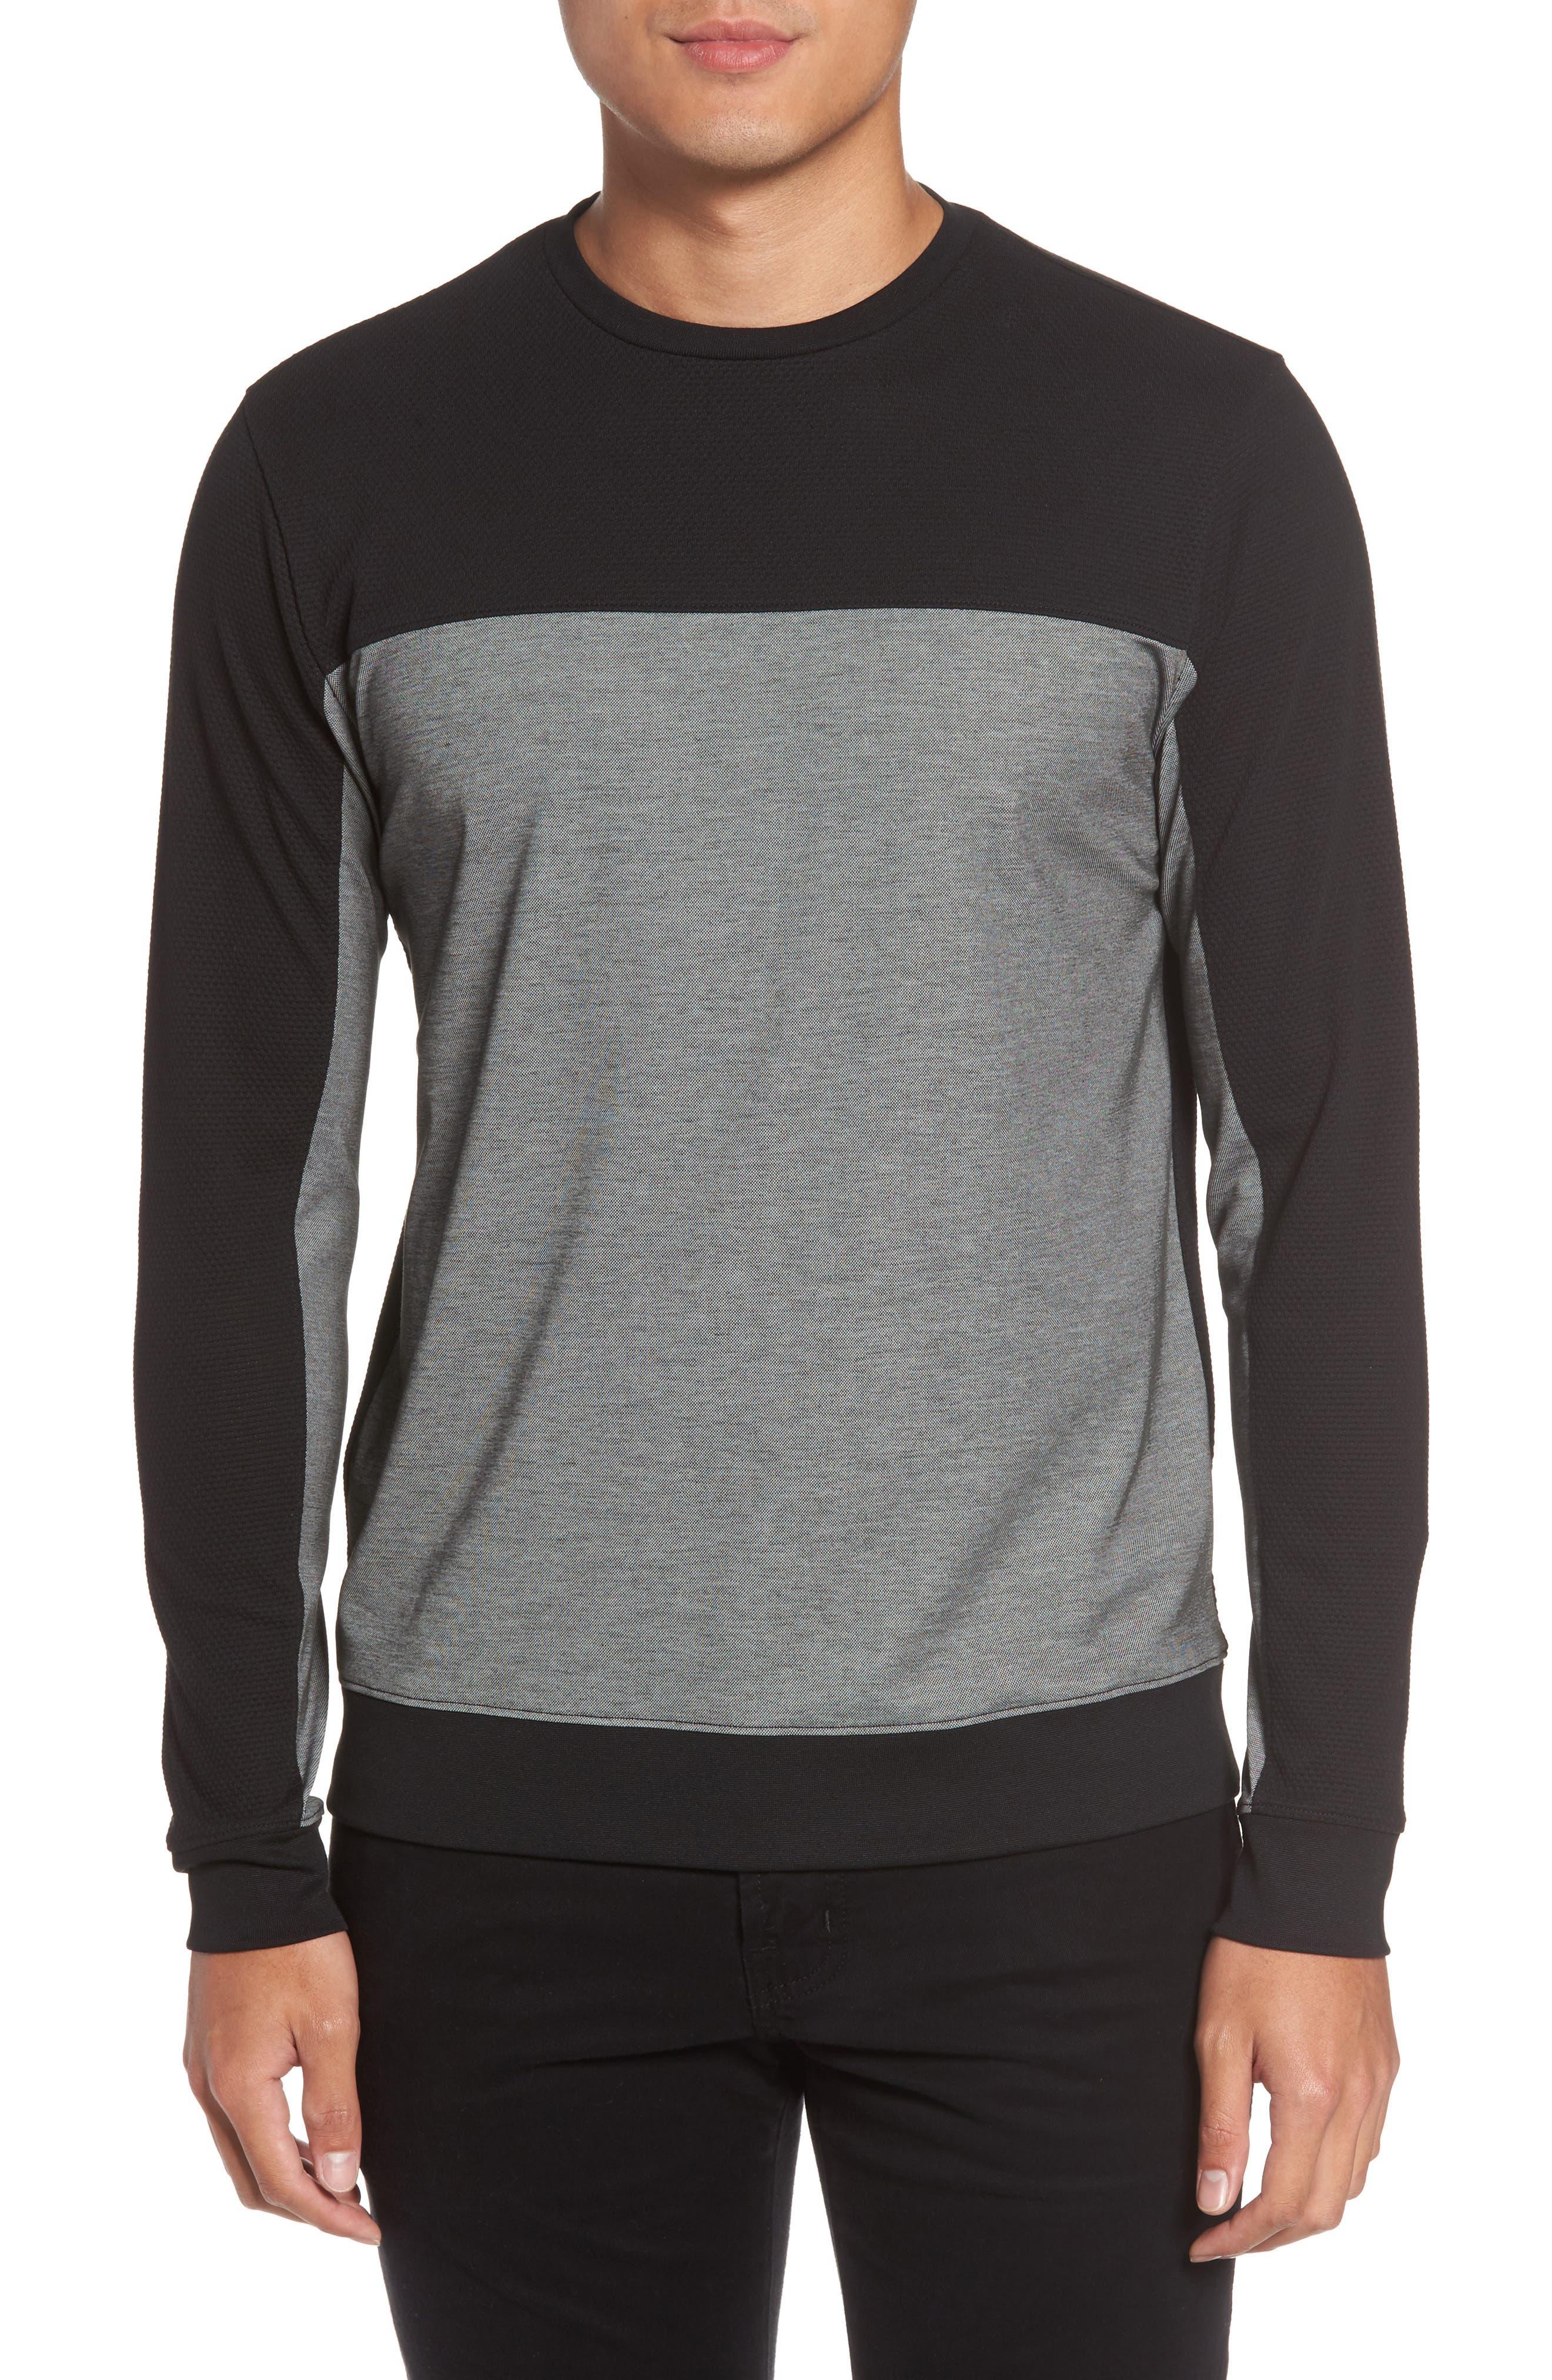 Alternate Image 1 Selected - Vince Colorblock Slim Fit Crewneck Sweater